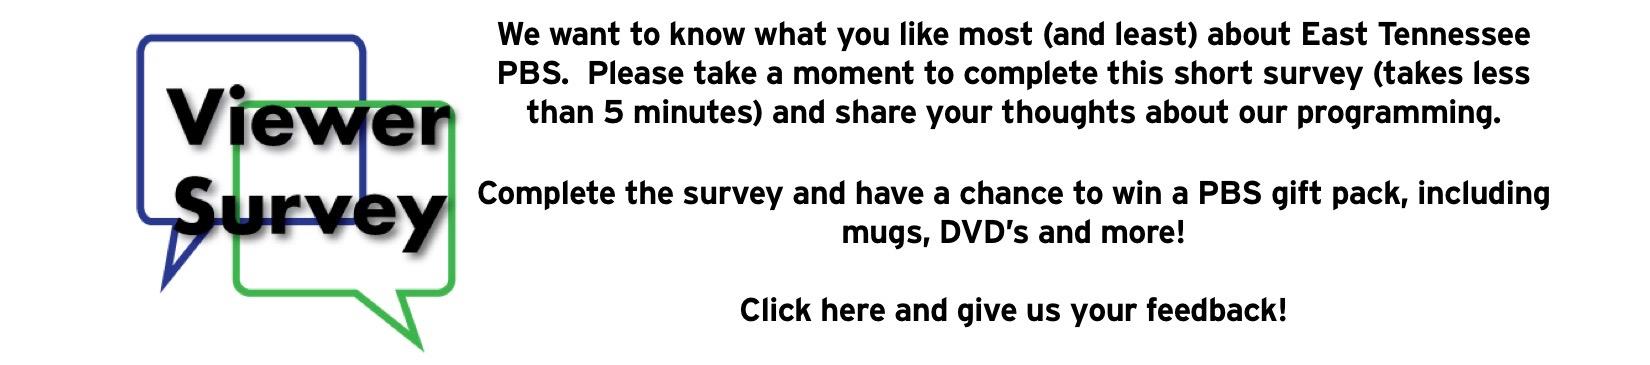 Viewer Survey.jpg